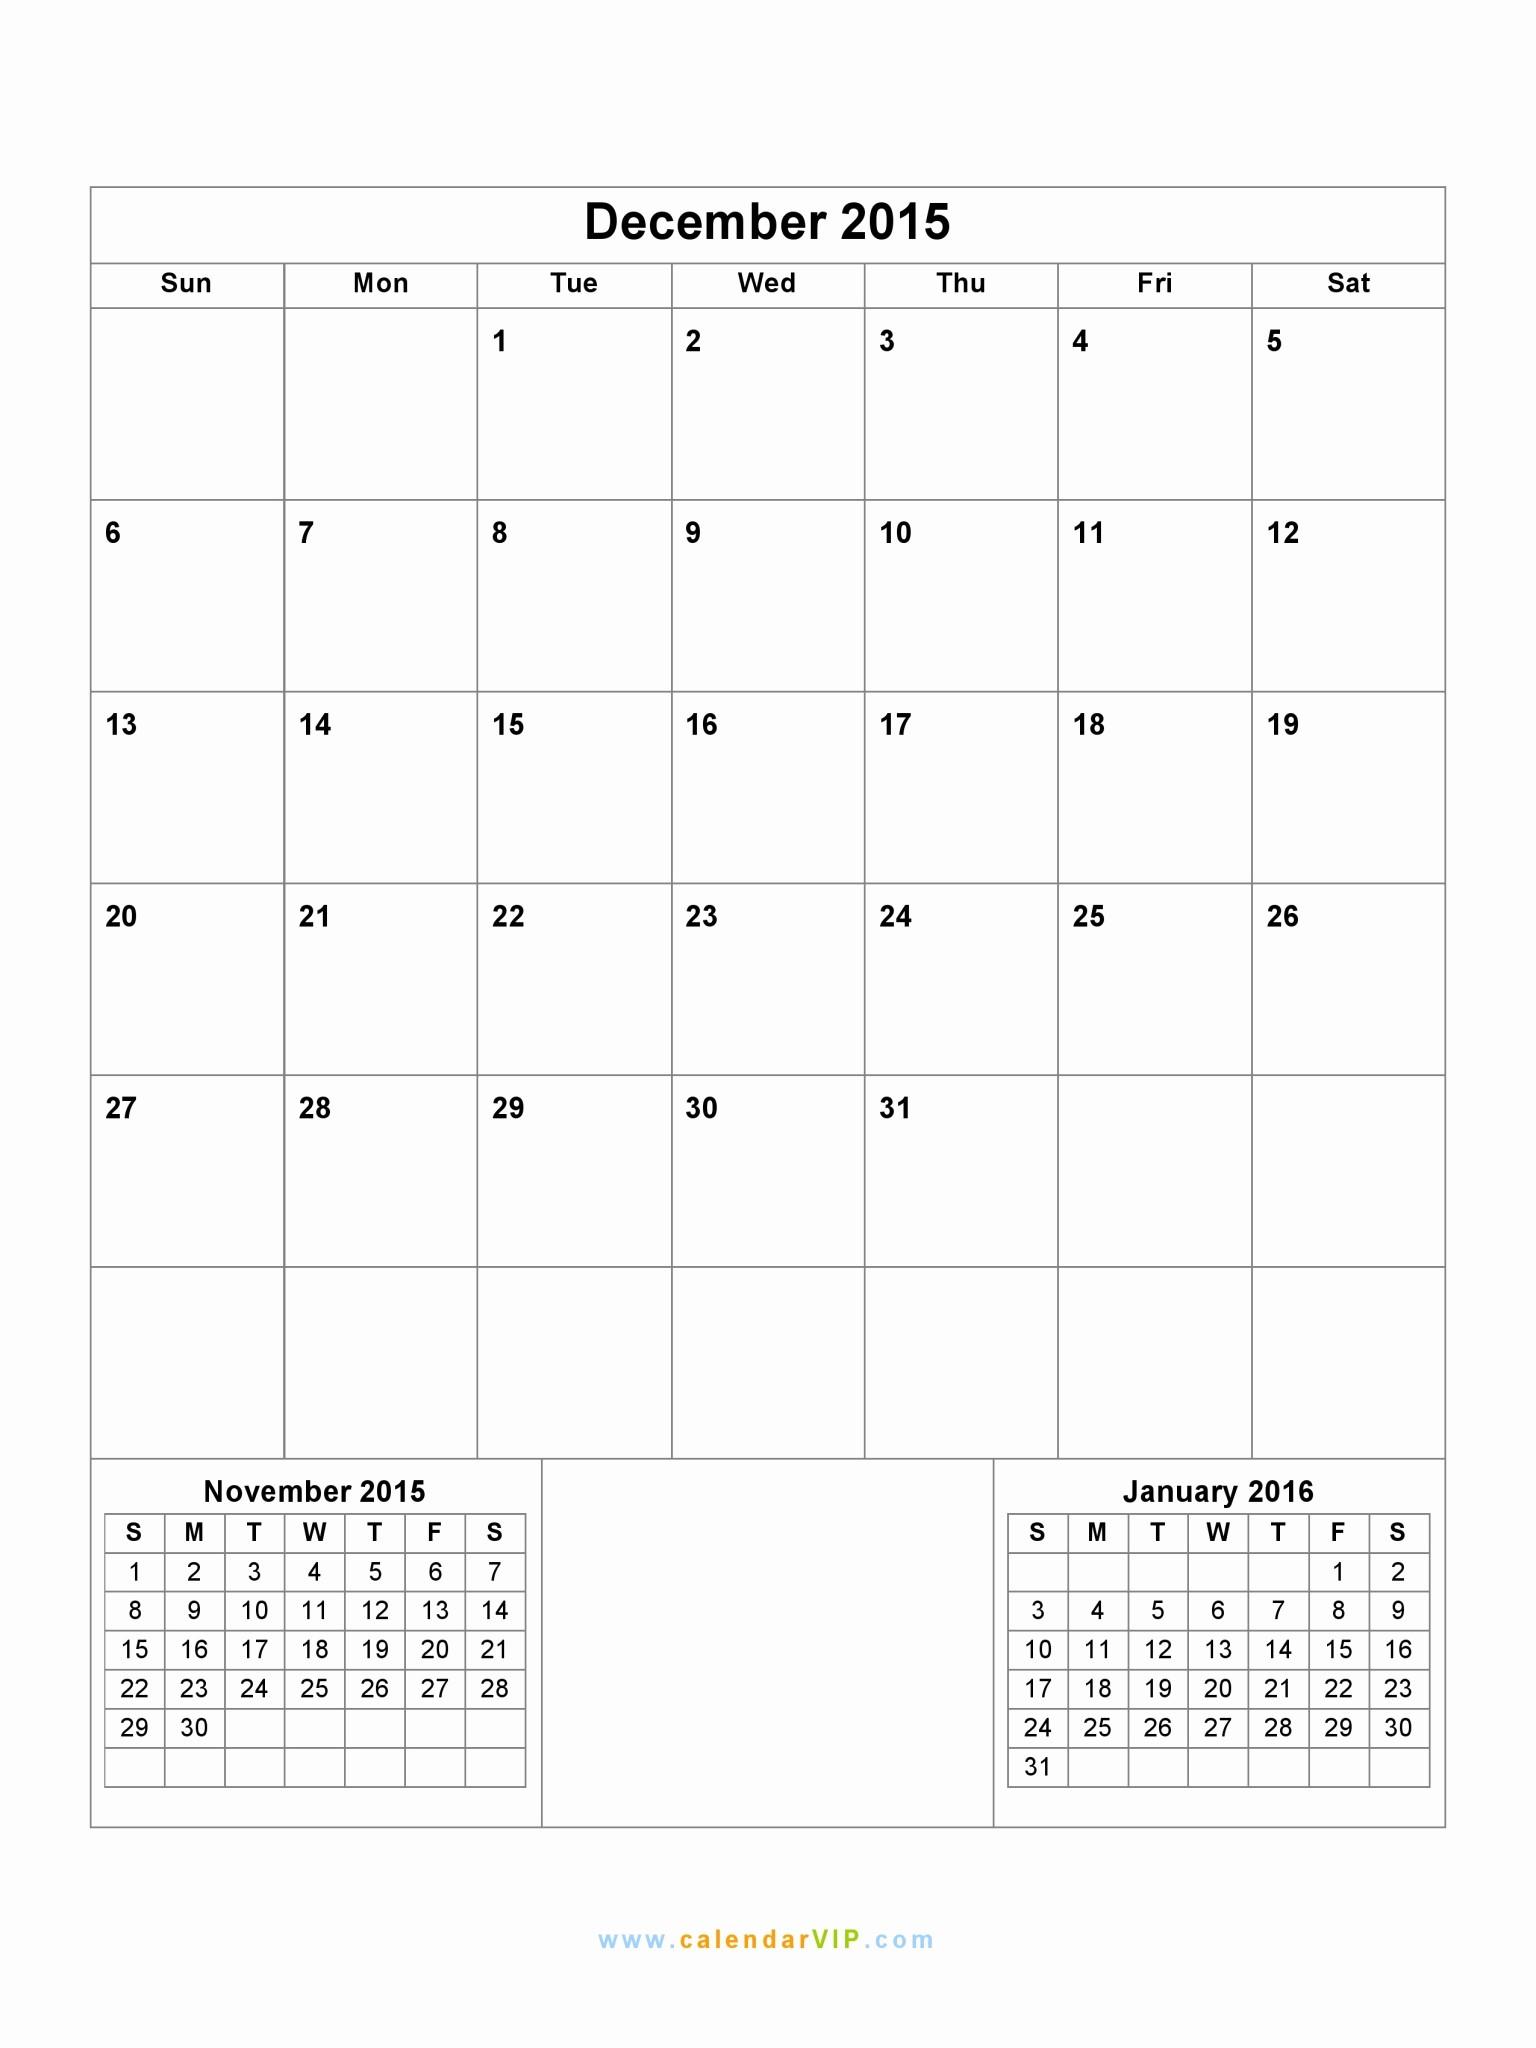 December 2015 Calendar Word Document Luxury December 2015 Calendar Blank Printable Calendar Template